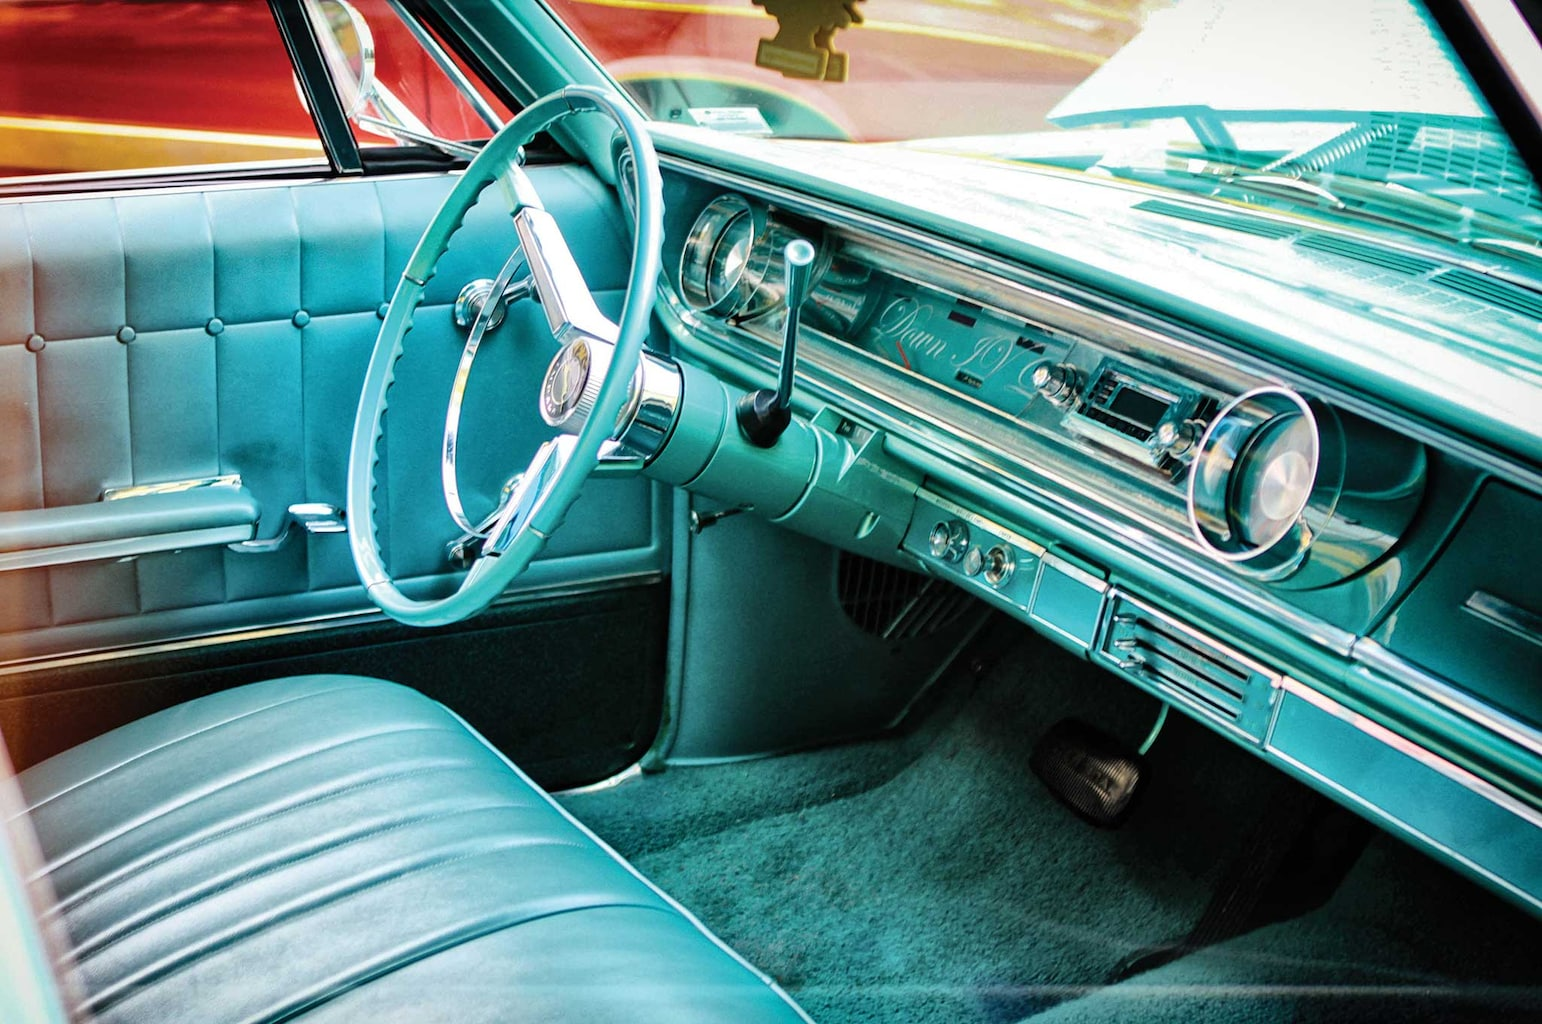 1965 chevrolet impala wagon factory steering wheel 005